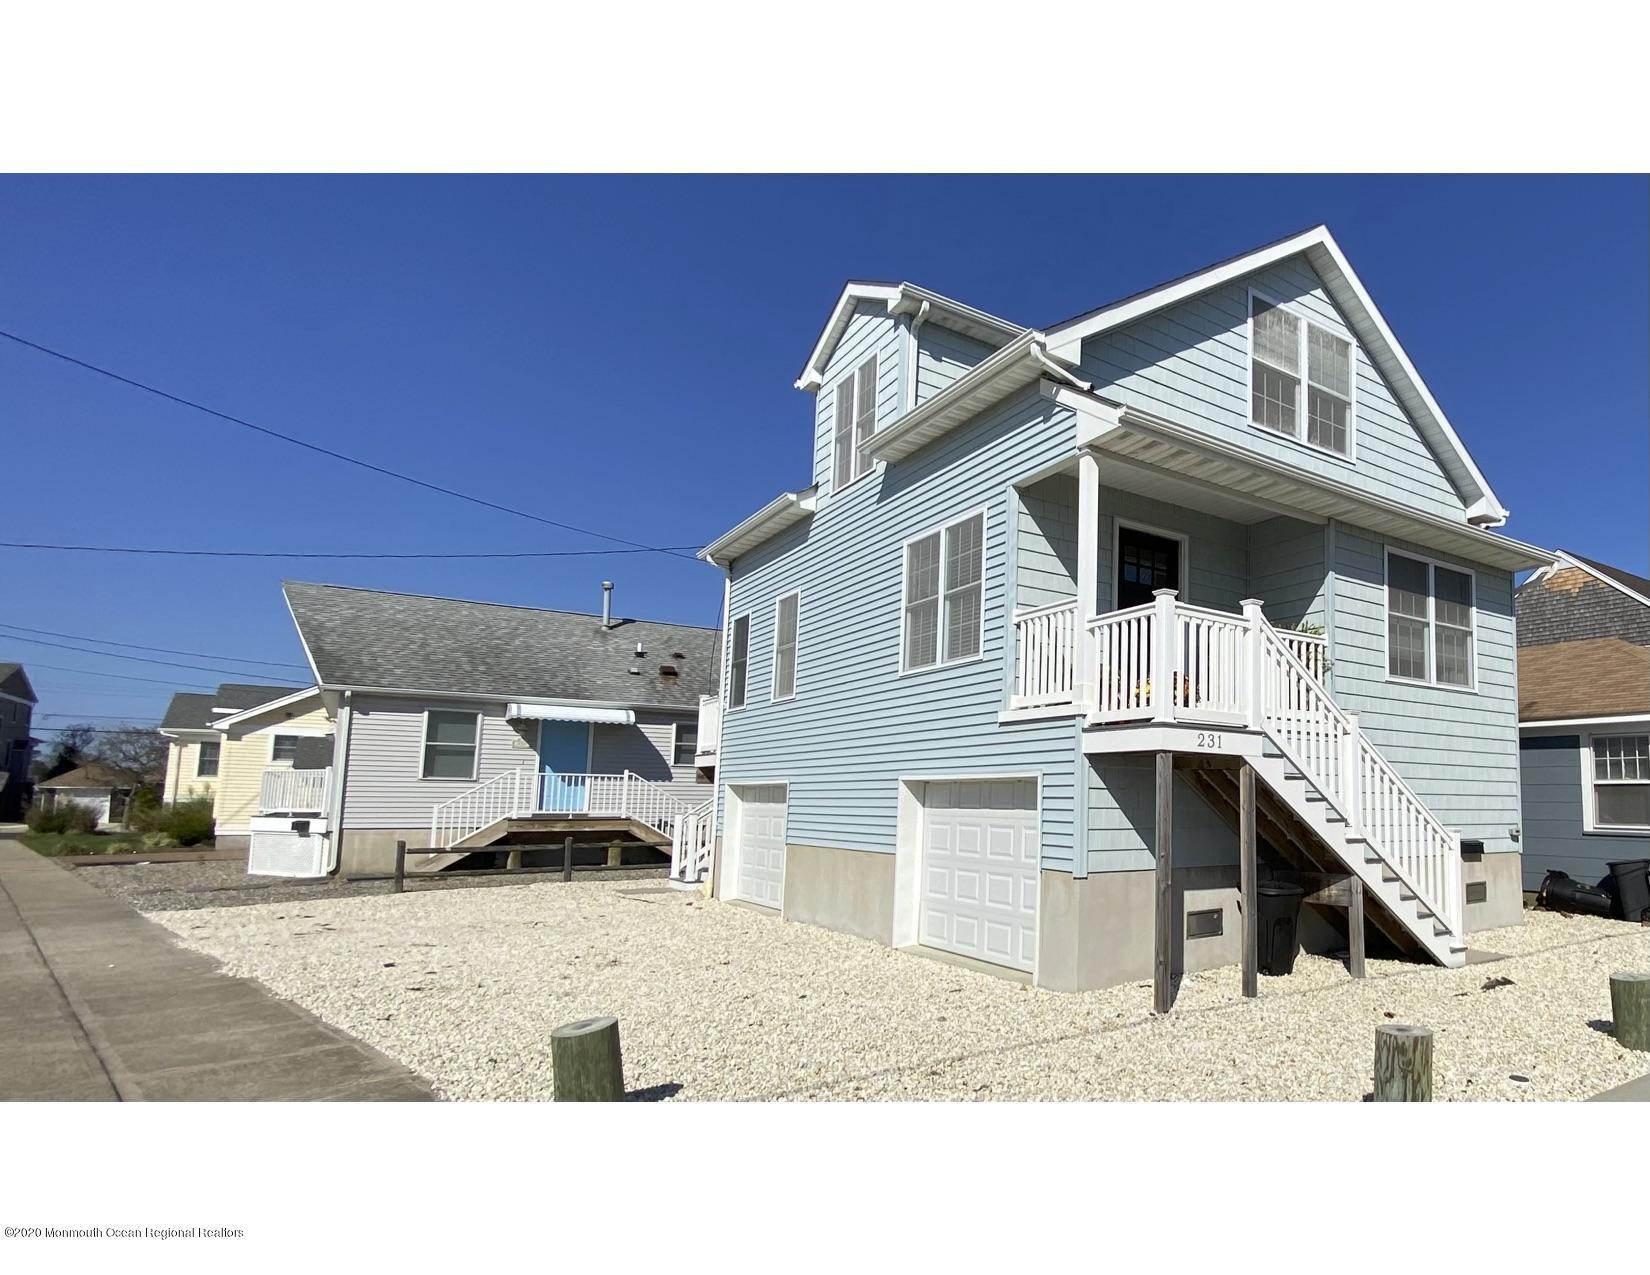 Photo of 231 Ocean Avenue, Point Pleasant Beach, NJ 08742